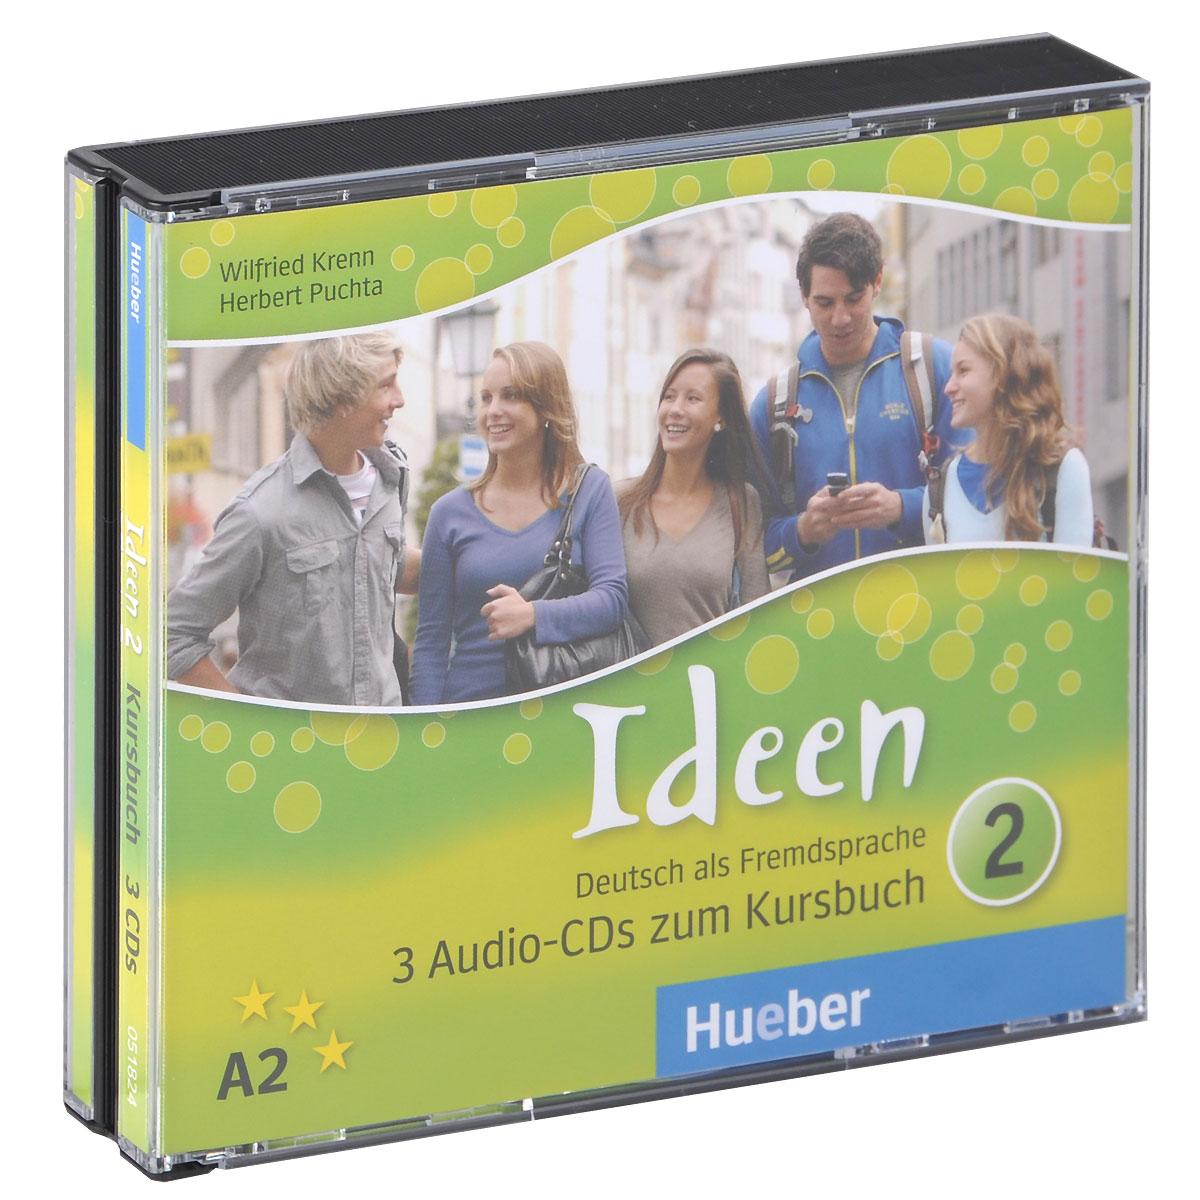 Ideen 2 (аудиокурс на 3 CD) islands level 2 class audio cds аудиокурс на 4 cd